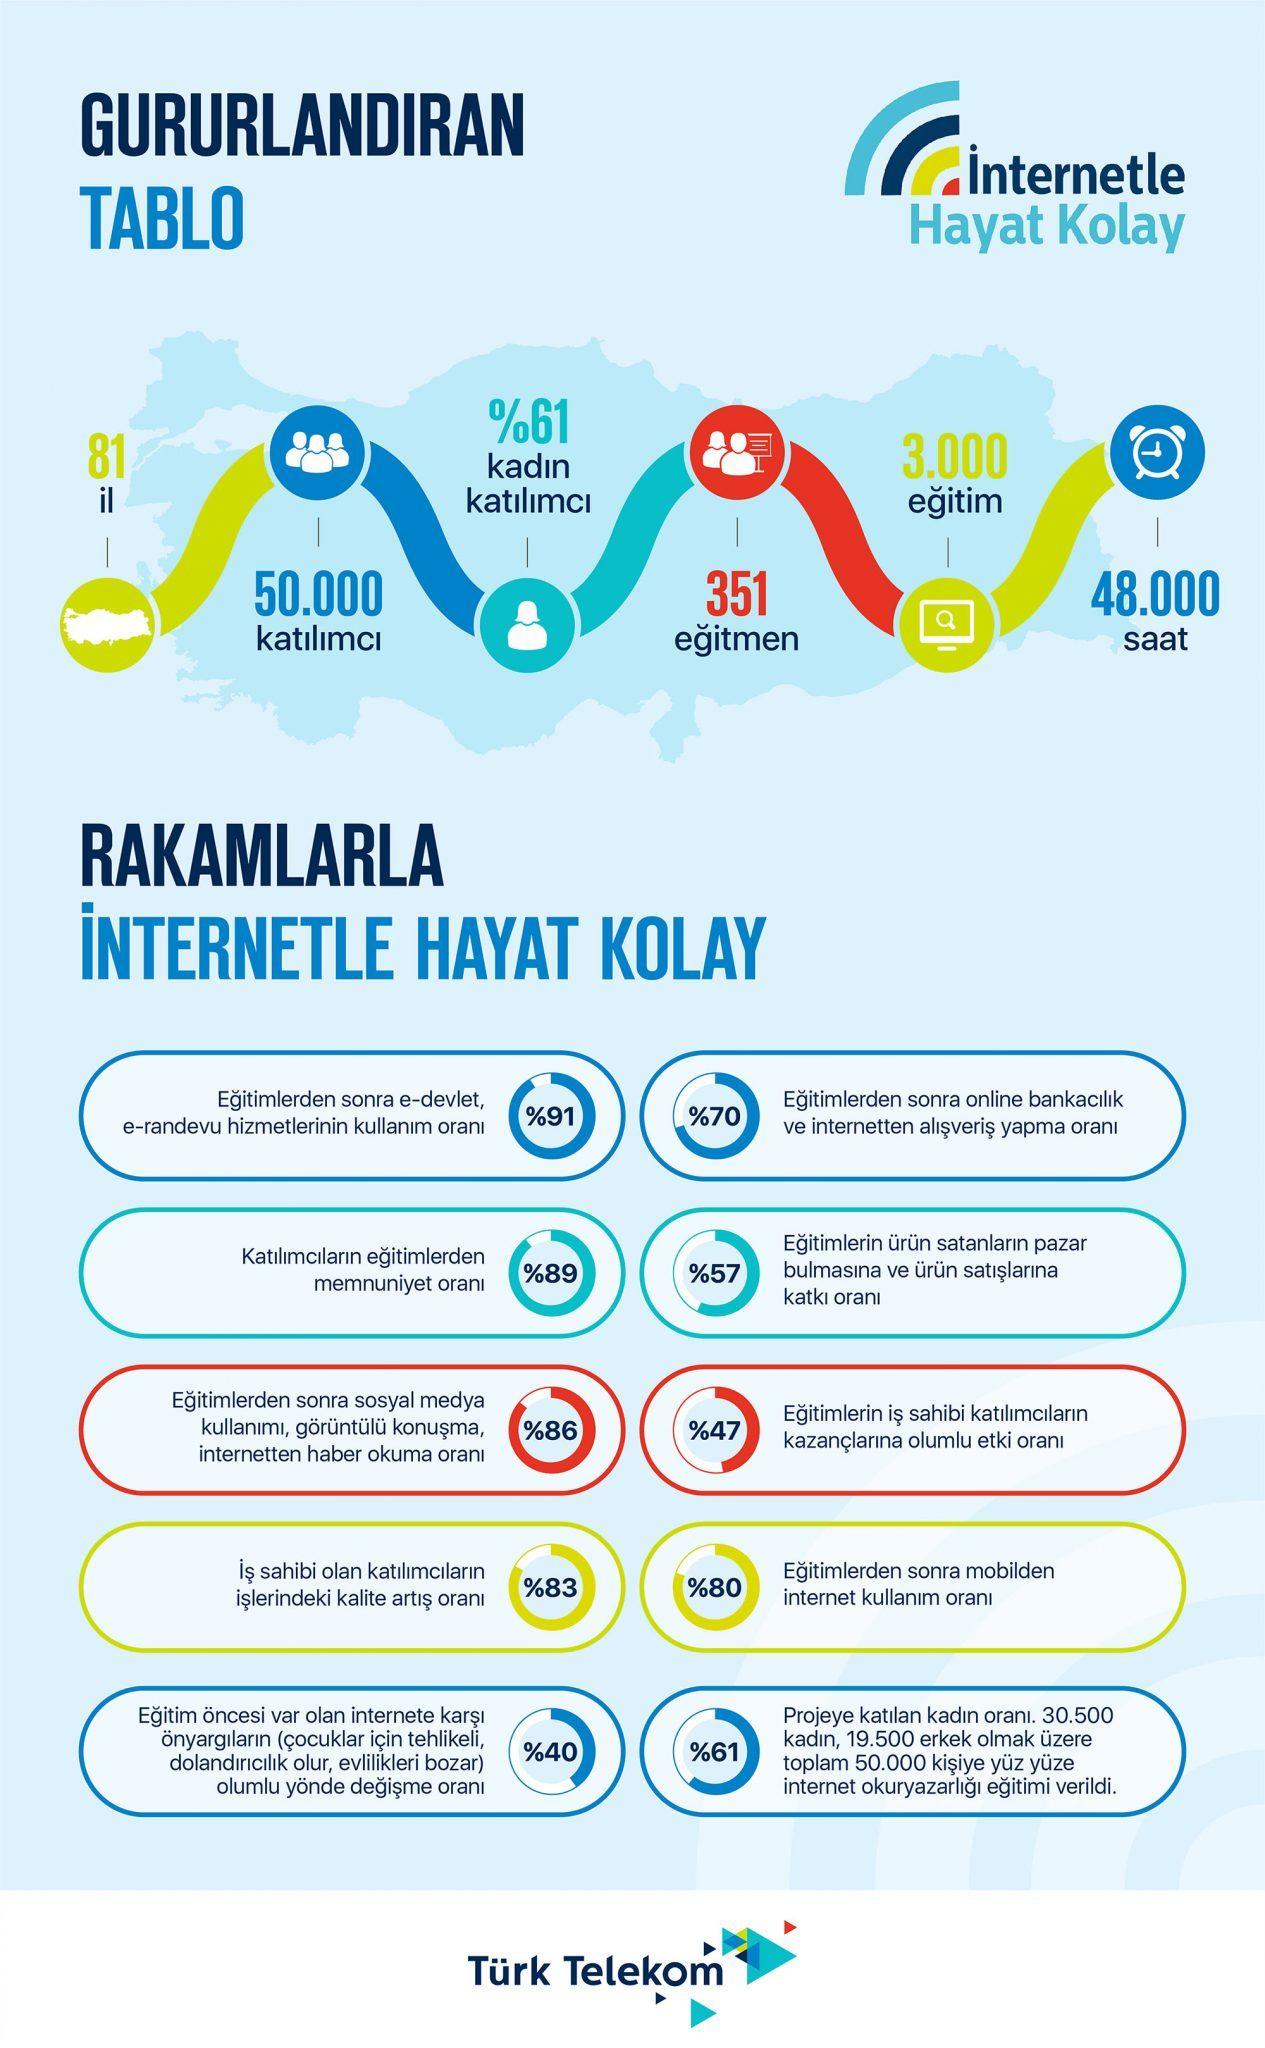 türk telekom internetle hayat kolay